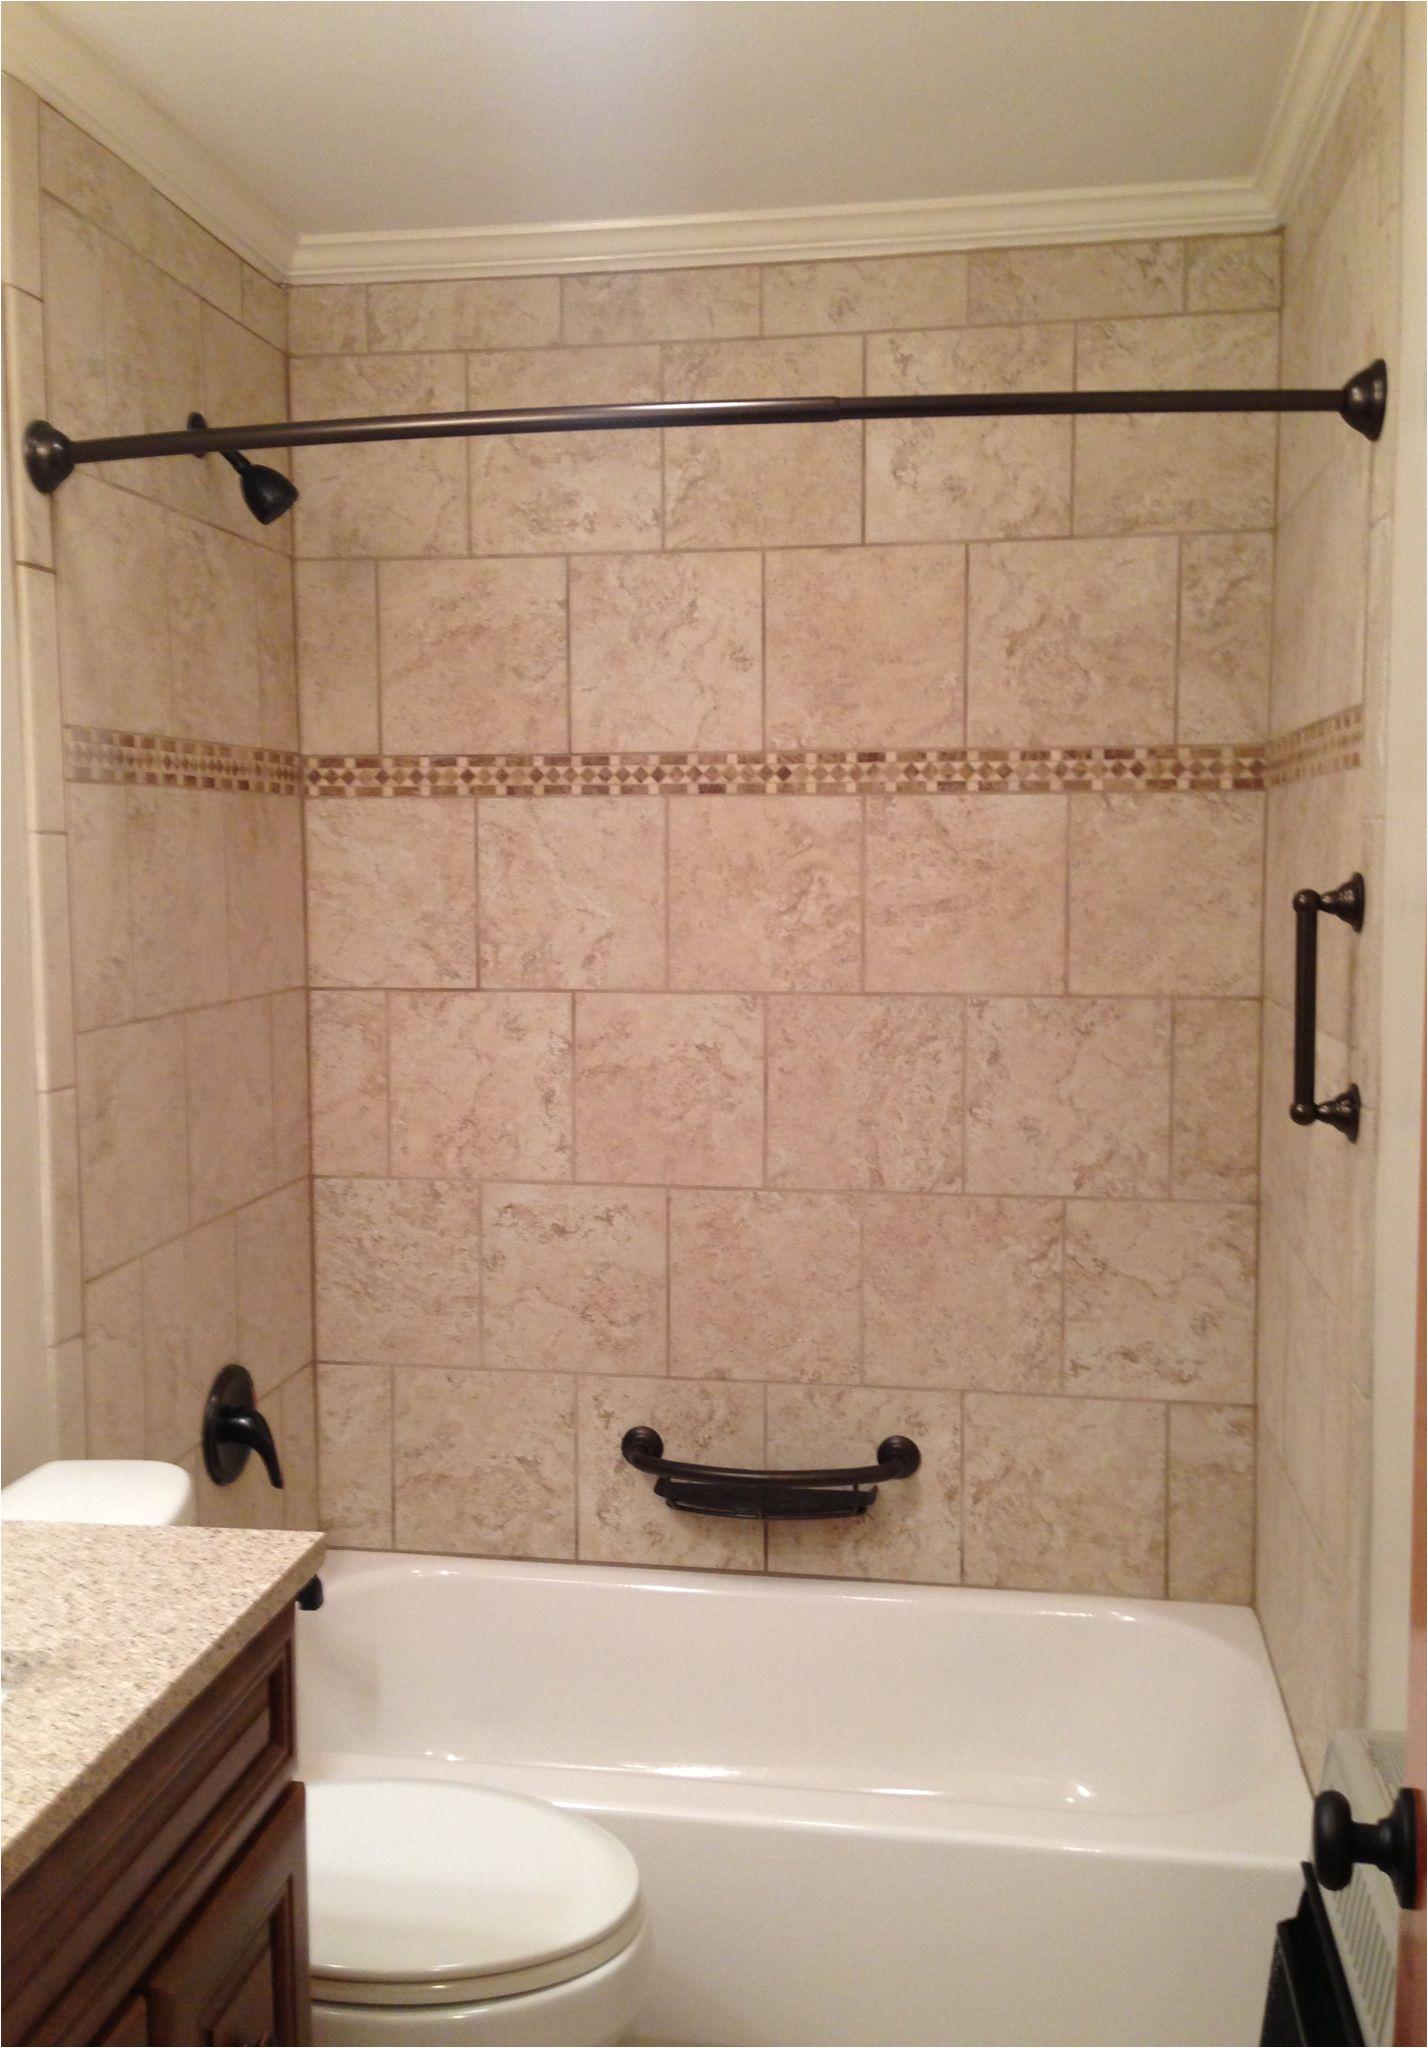 Install Bathtub Surround Over Ceramic Tile Tile Tub Surround Beige Tile Bathtub Surround with Oil